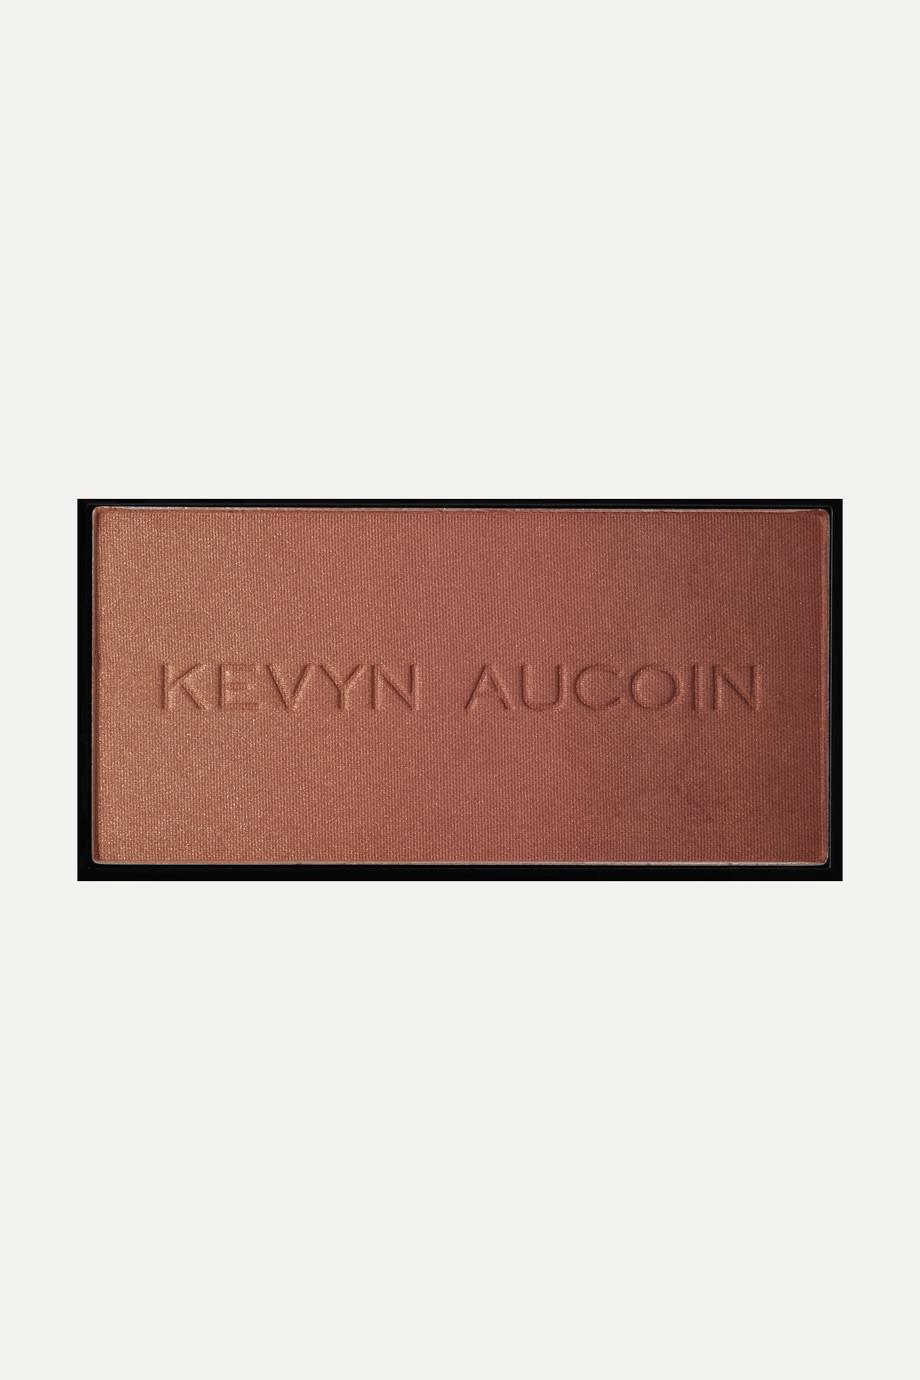 Kevyn Aucoin The Neo Bronzer - Sundown